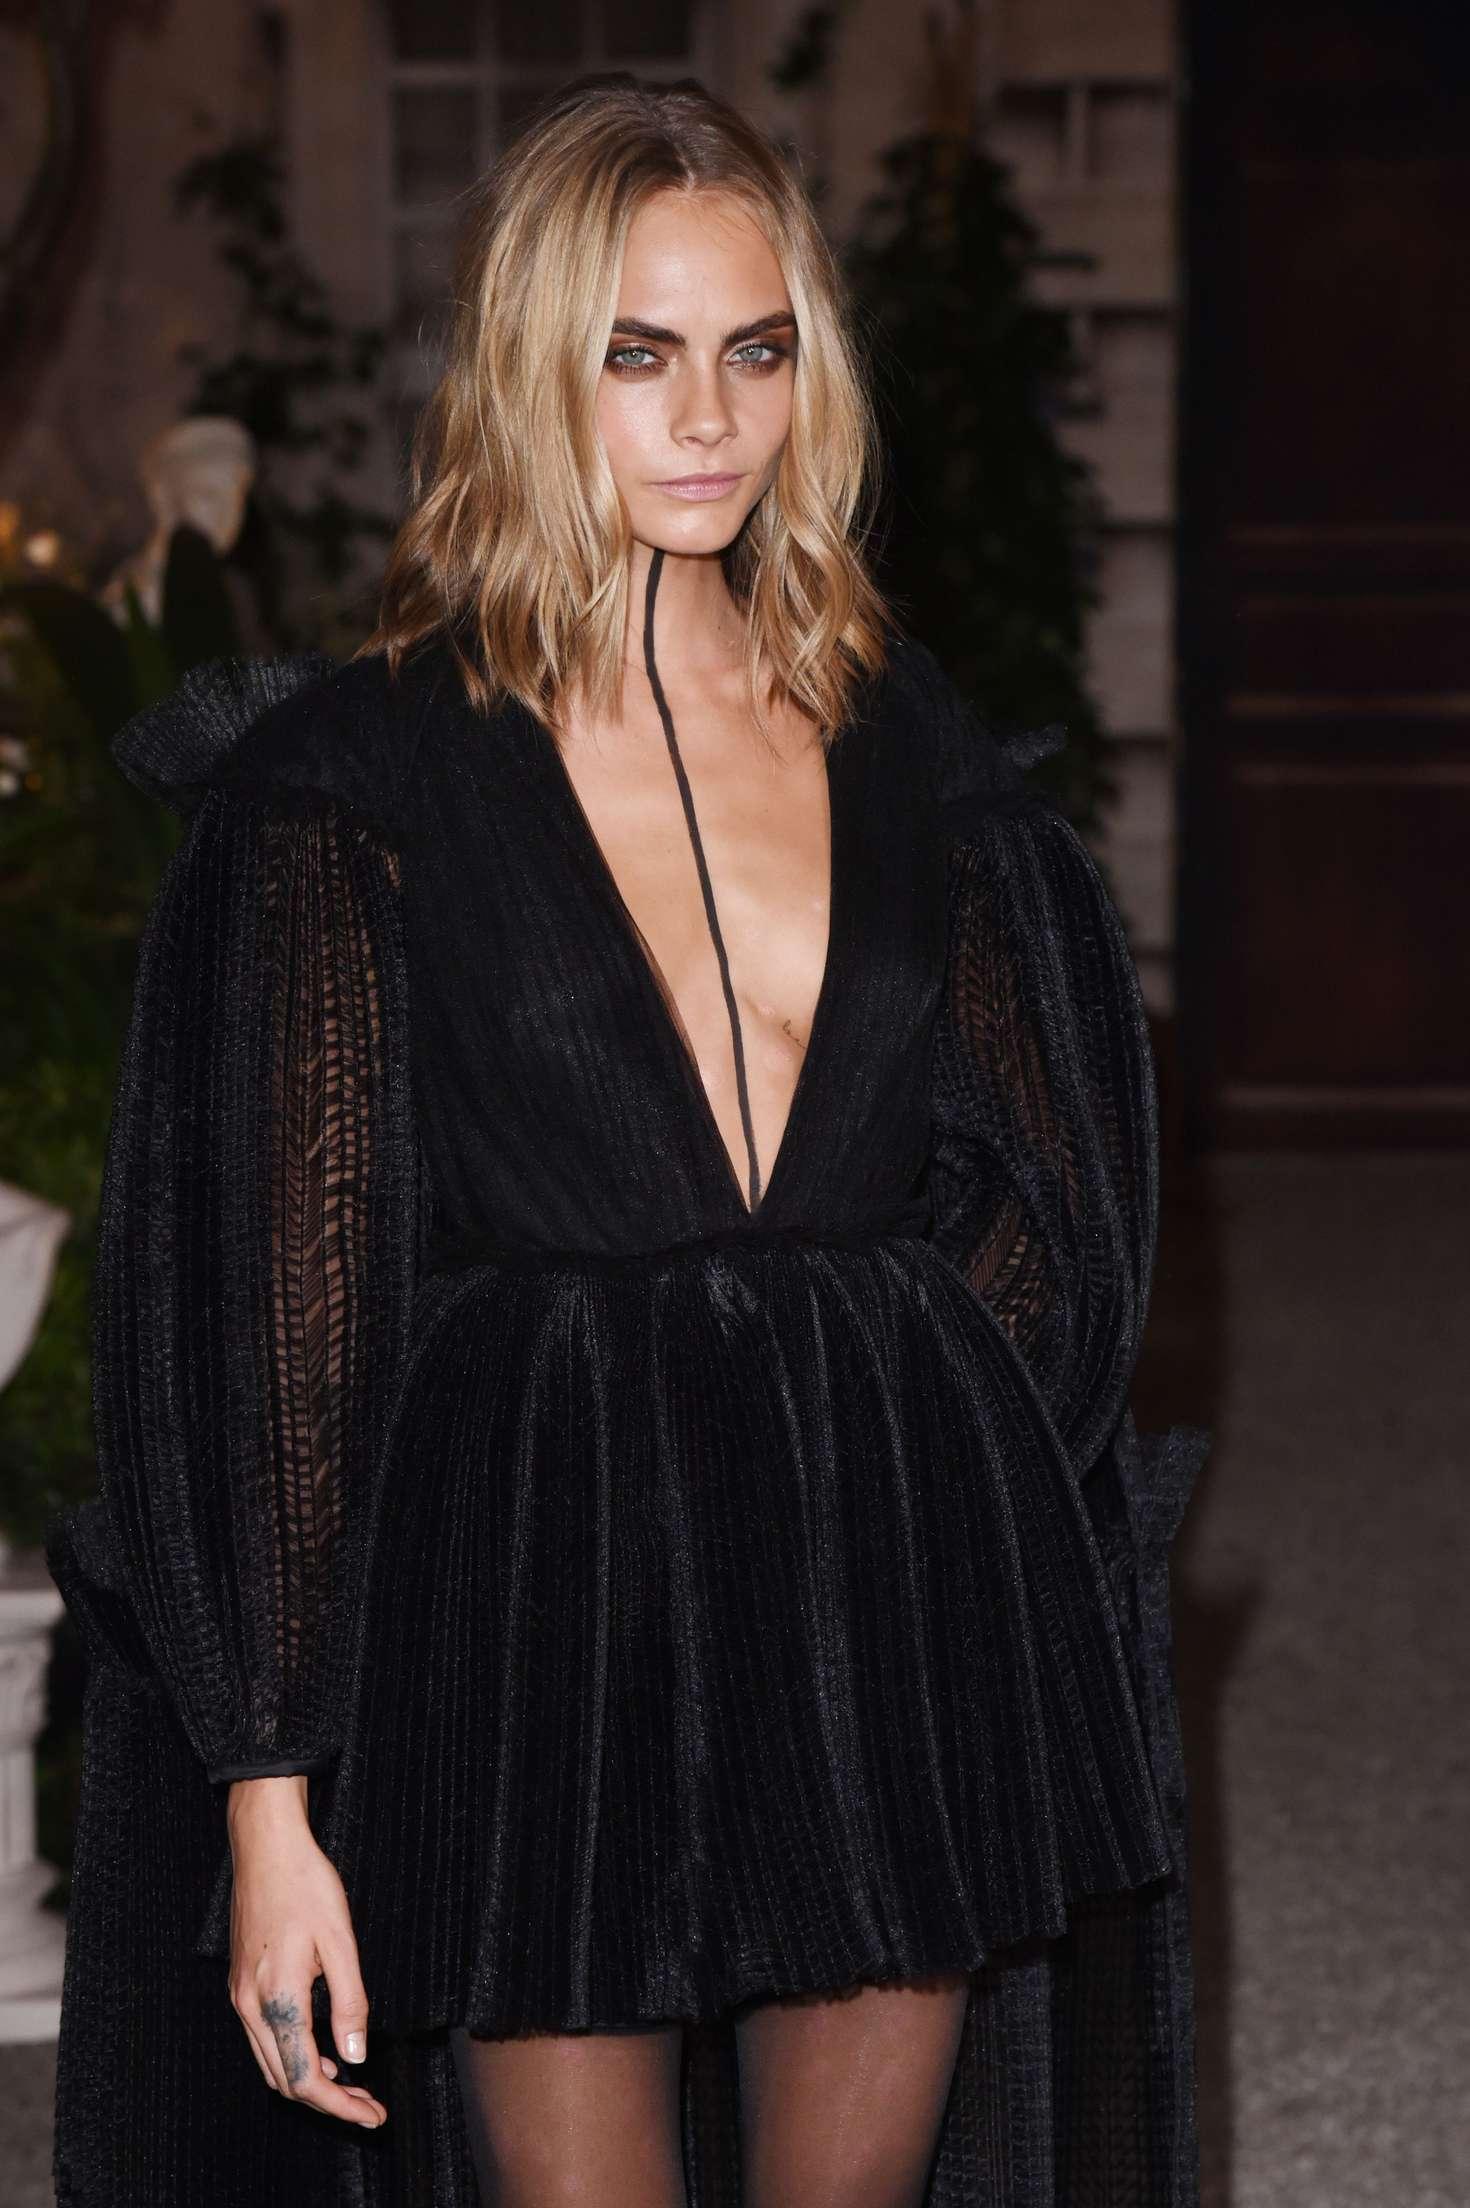 Cara Delevingne Burberry Show 2016 At London Fashion Week